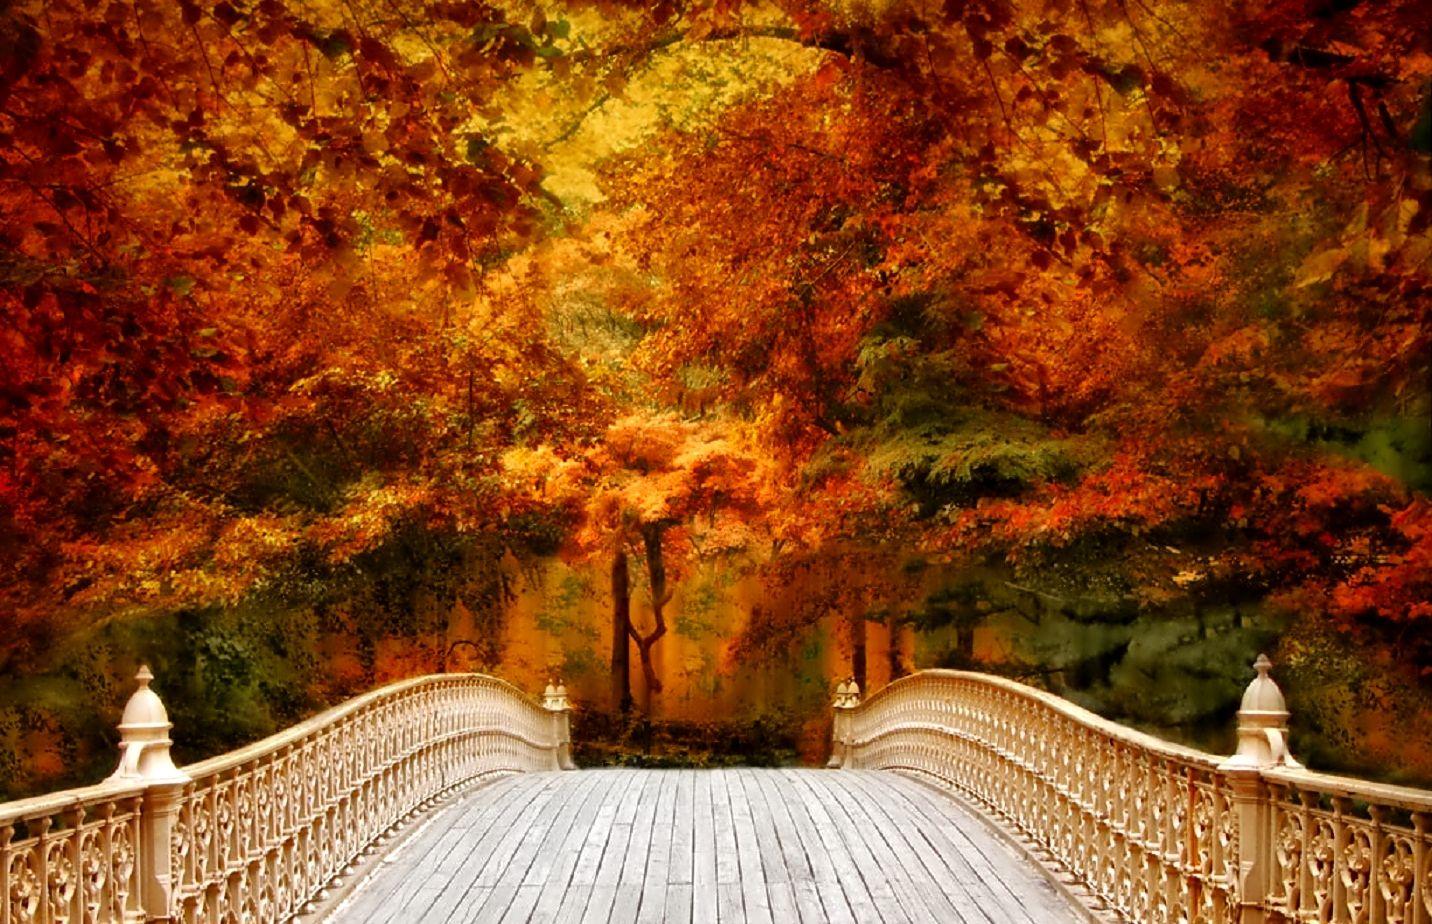 October Wallpapers High Quality #octoberwallpaper